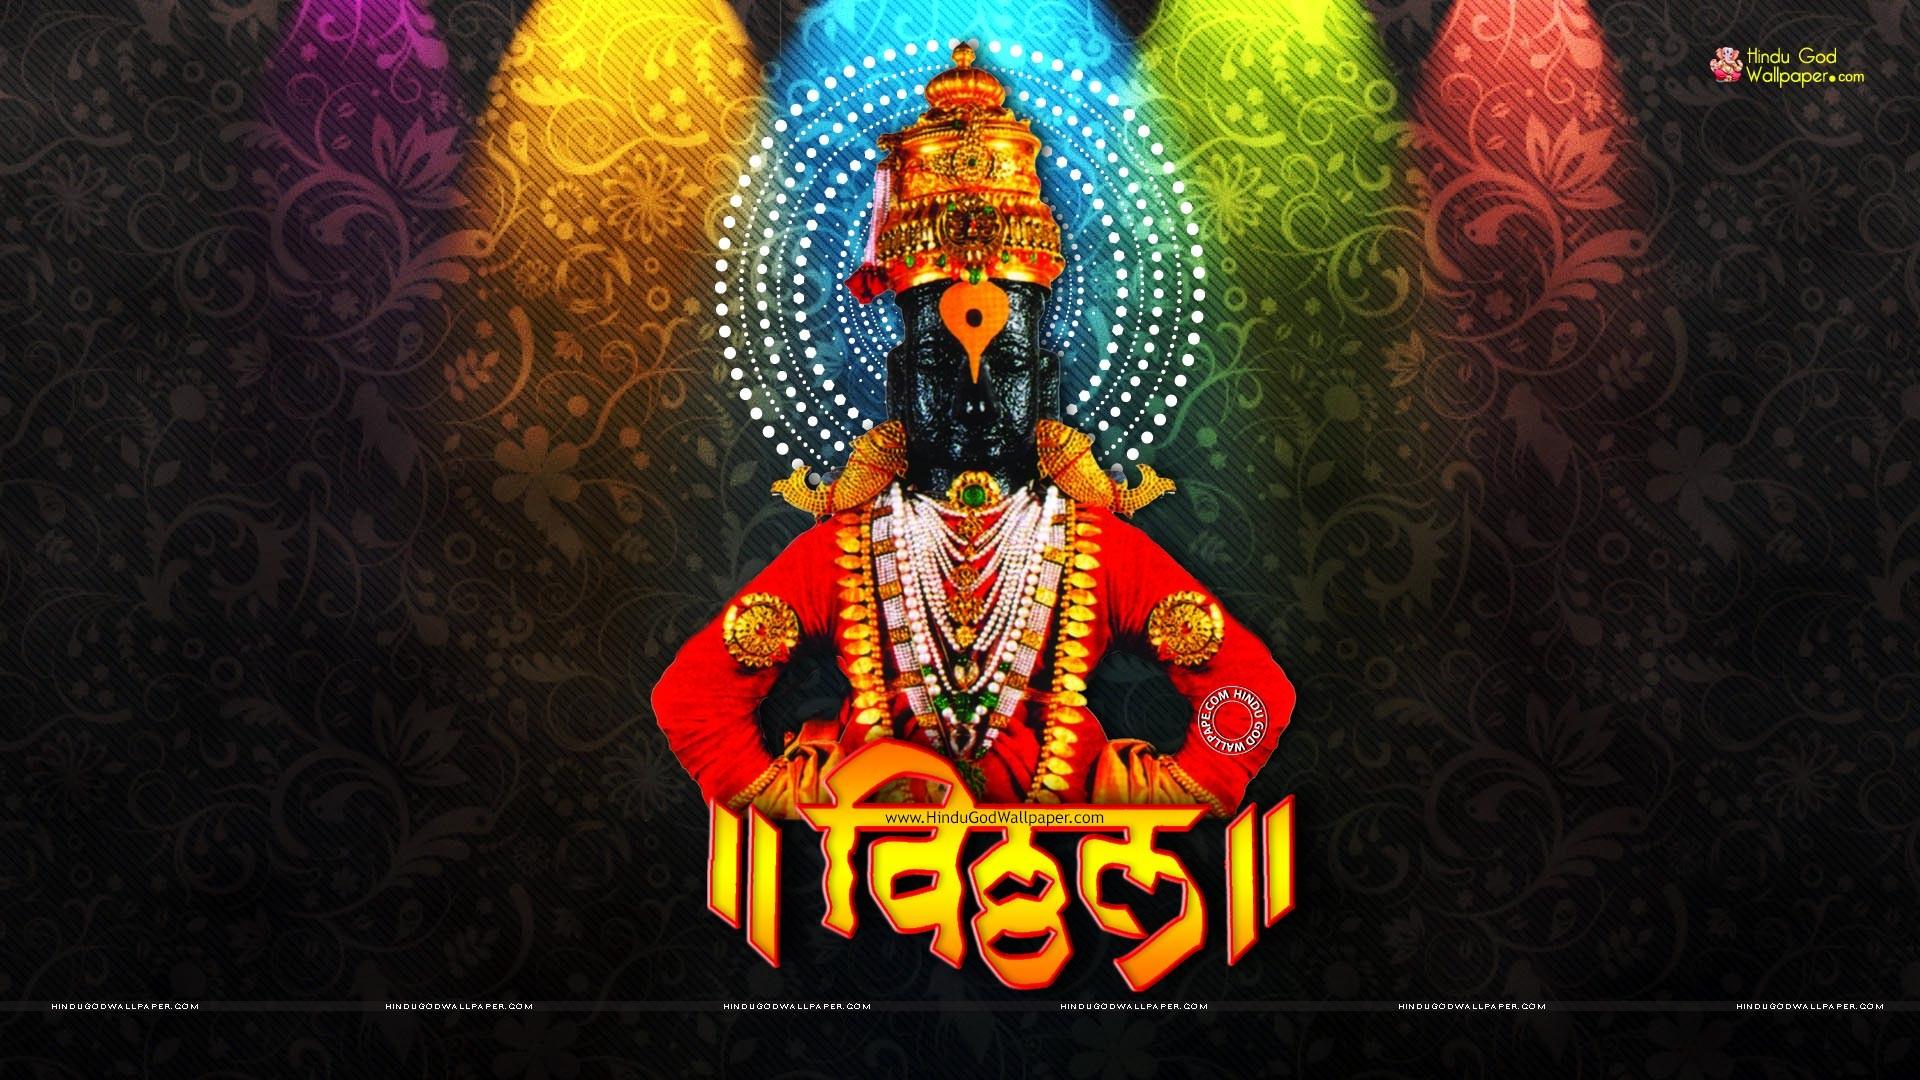 God Images Download Hd For Mobile